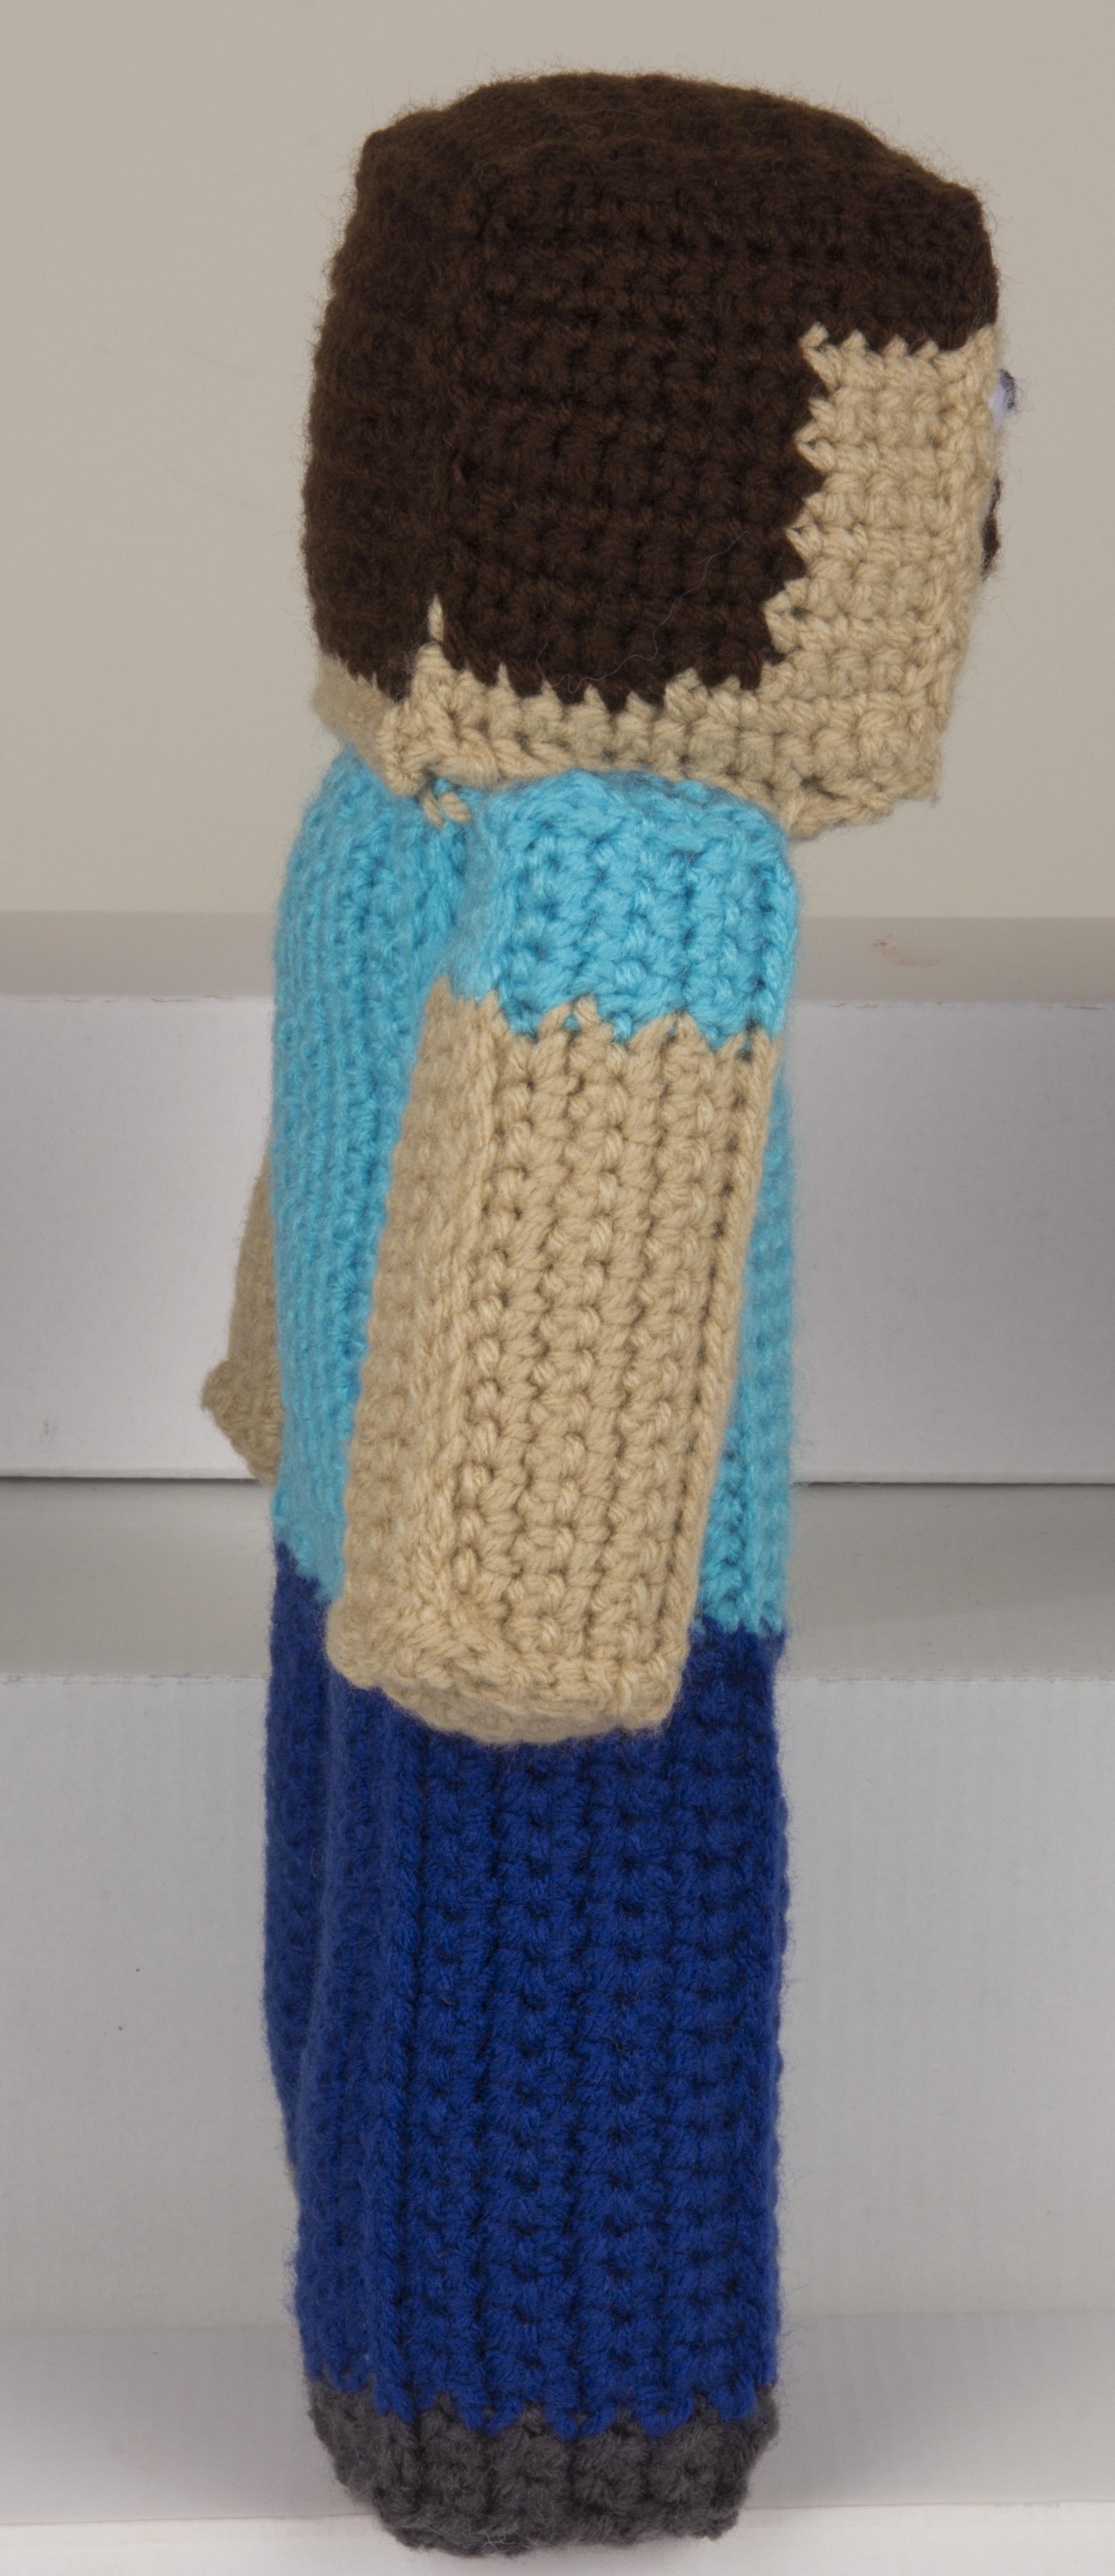 Second Crocheted Minecraft Steve Doll Yochet